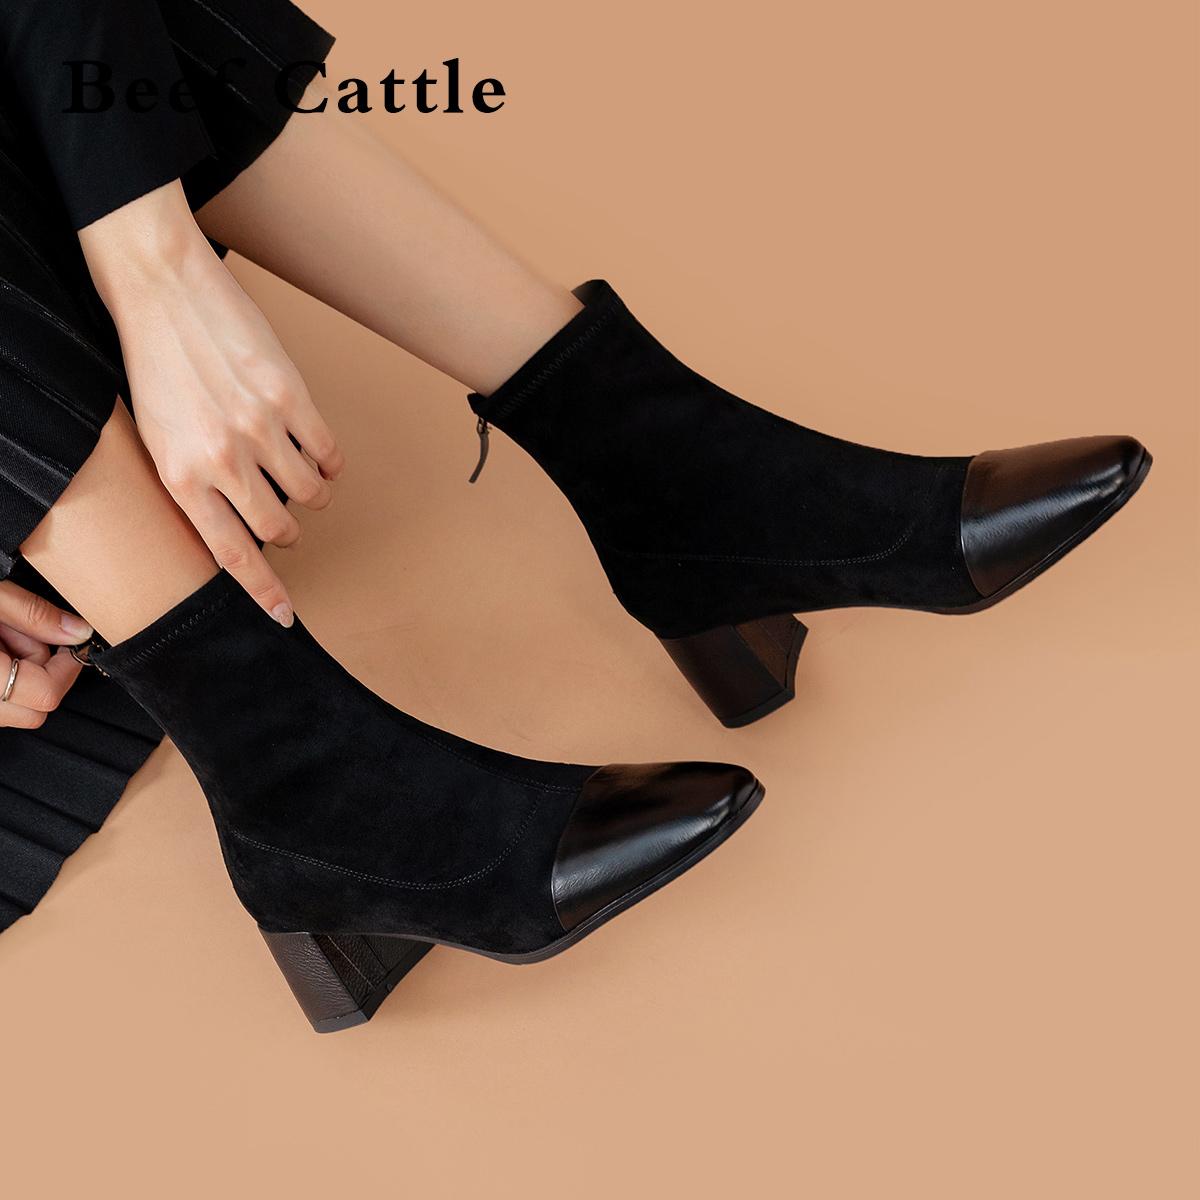 BF粗跟短靴女中跟方头真皮拼接弹力靴2021秋冬新款韩版百搭女袜靴